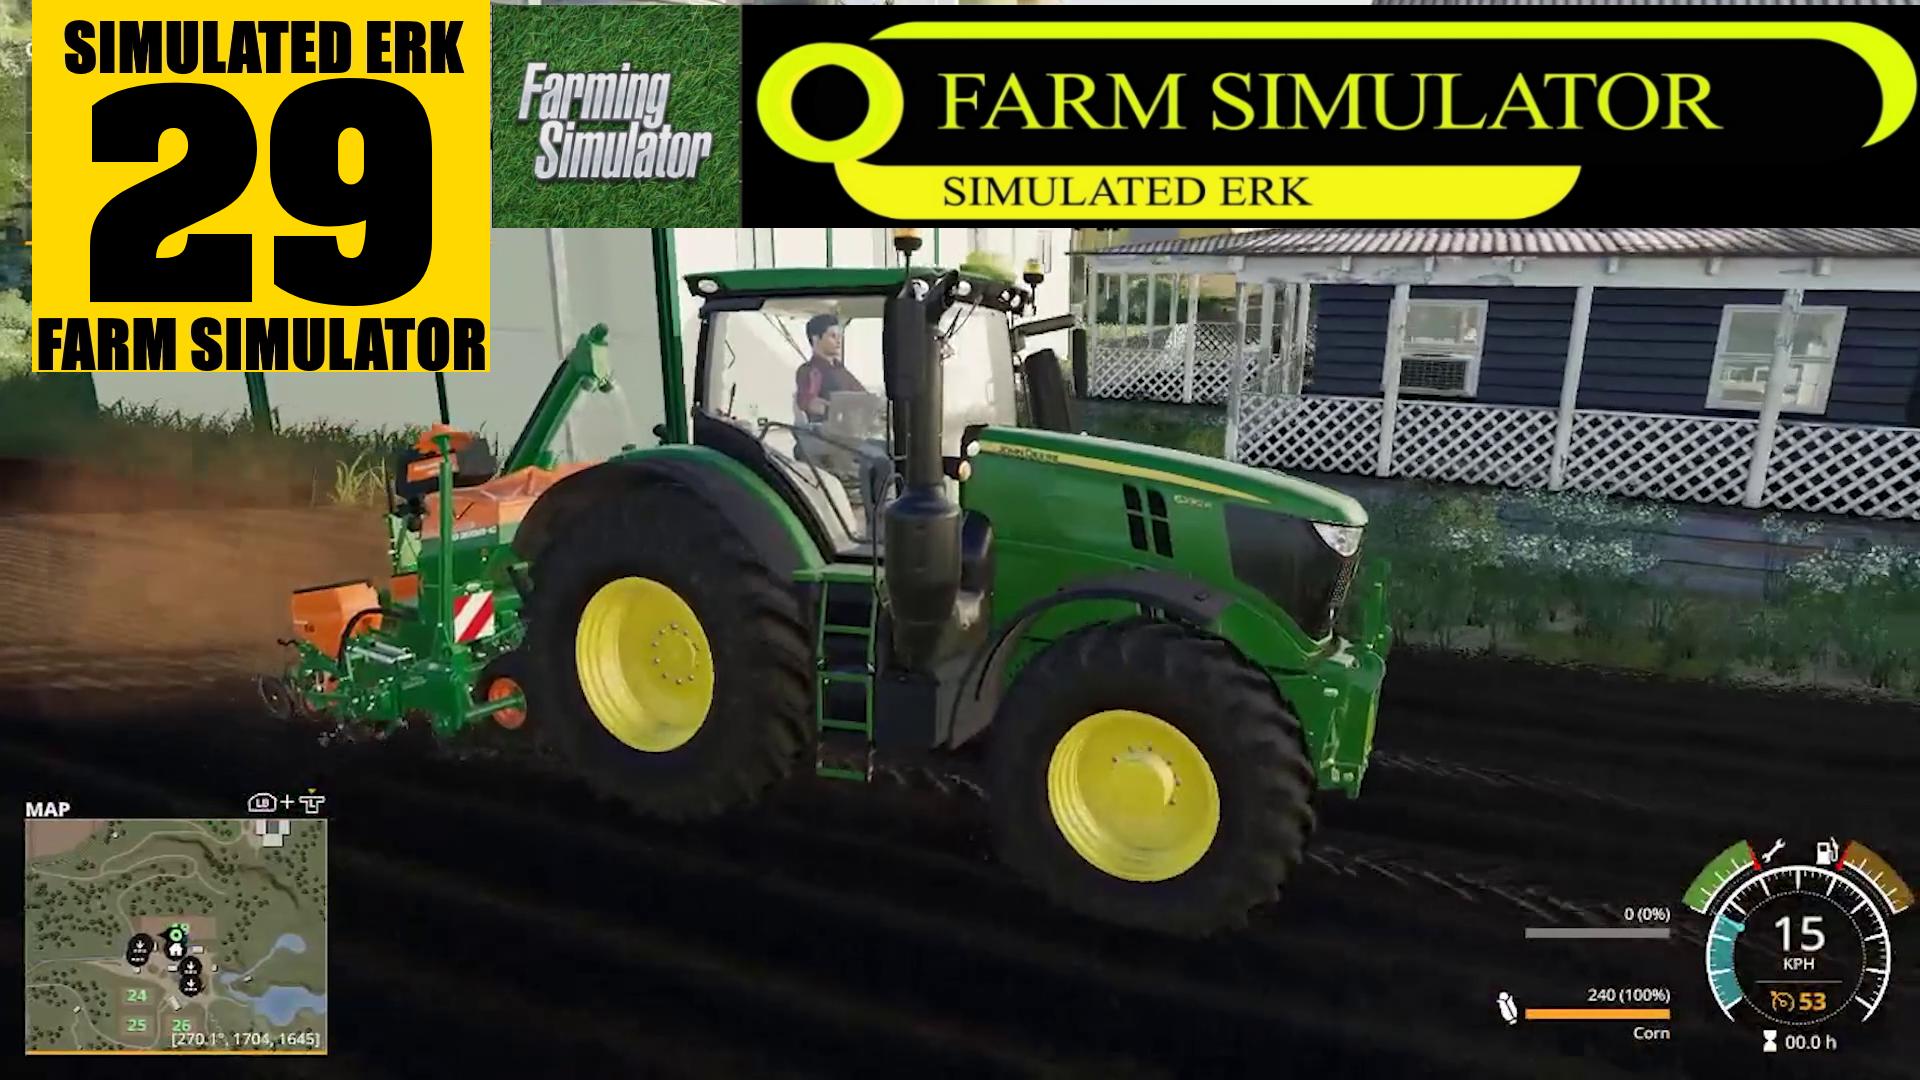 Simulated Erk: Farm Simulator episode 29 | Setting Up A New Farm